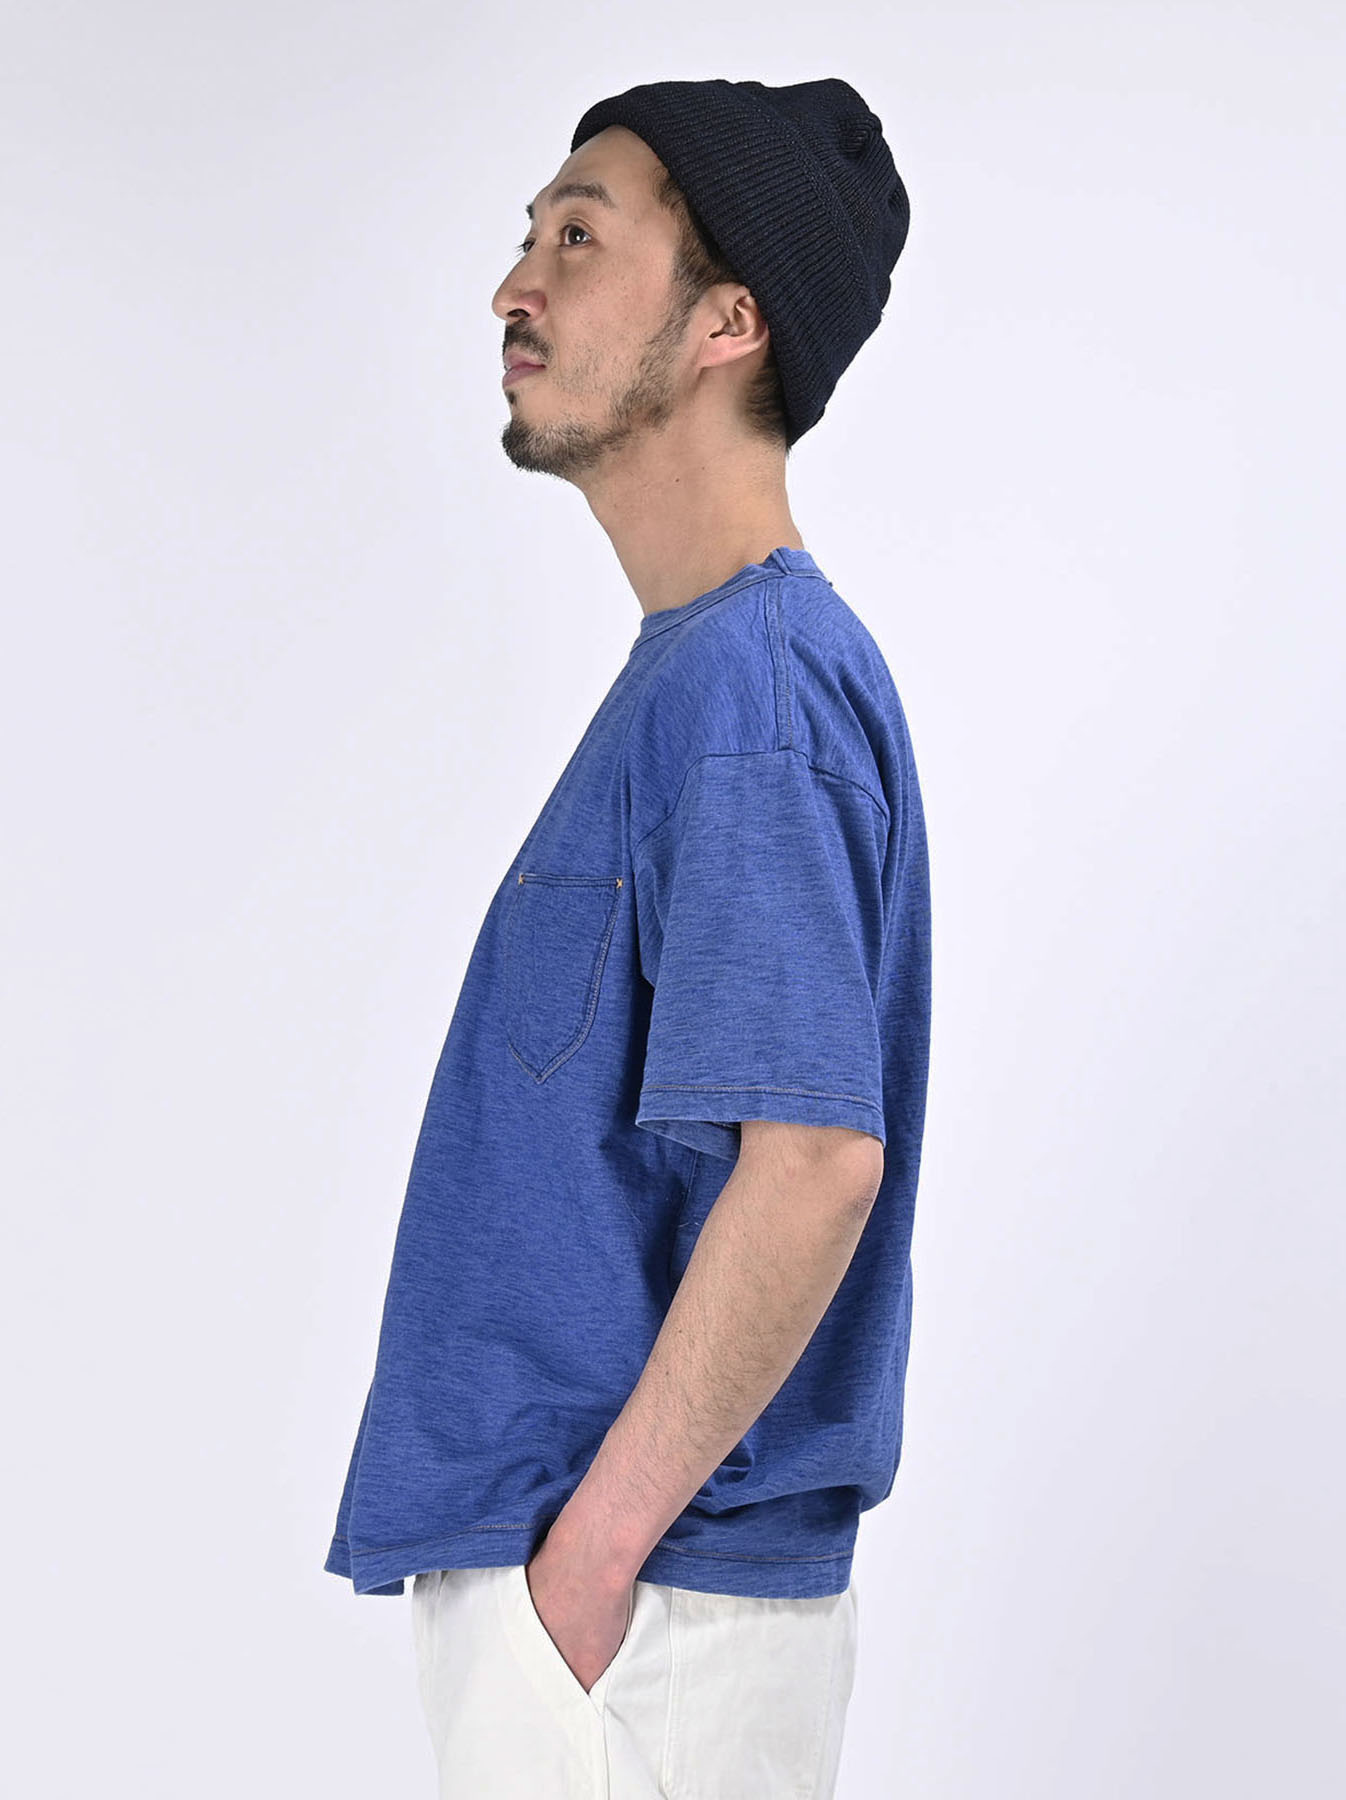 Distressed Indigo Tenjiku 908 Ocean T-Shirt (0621)-4